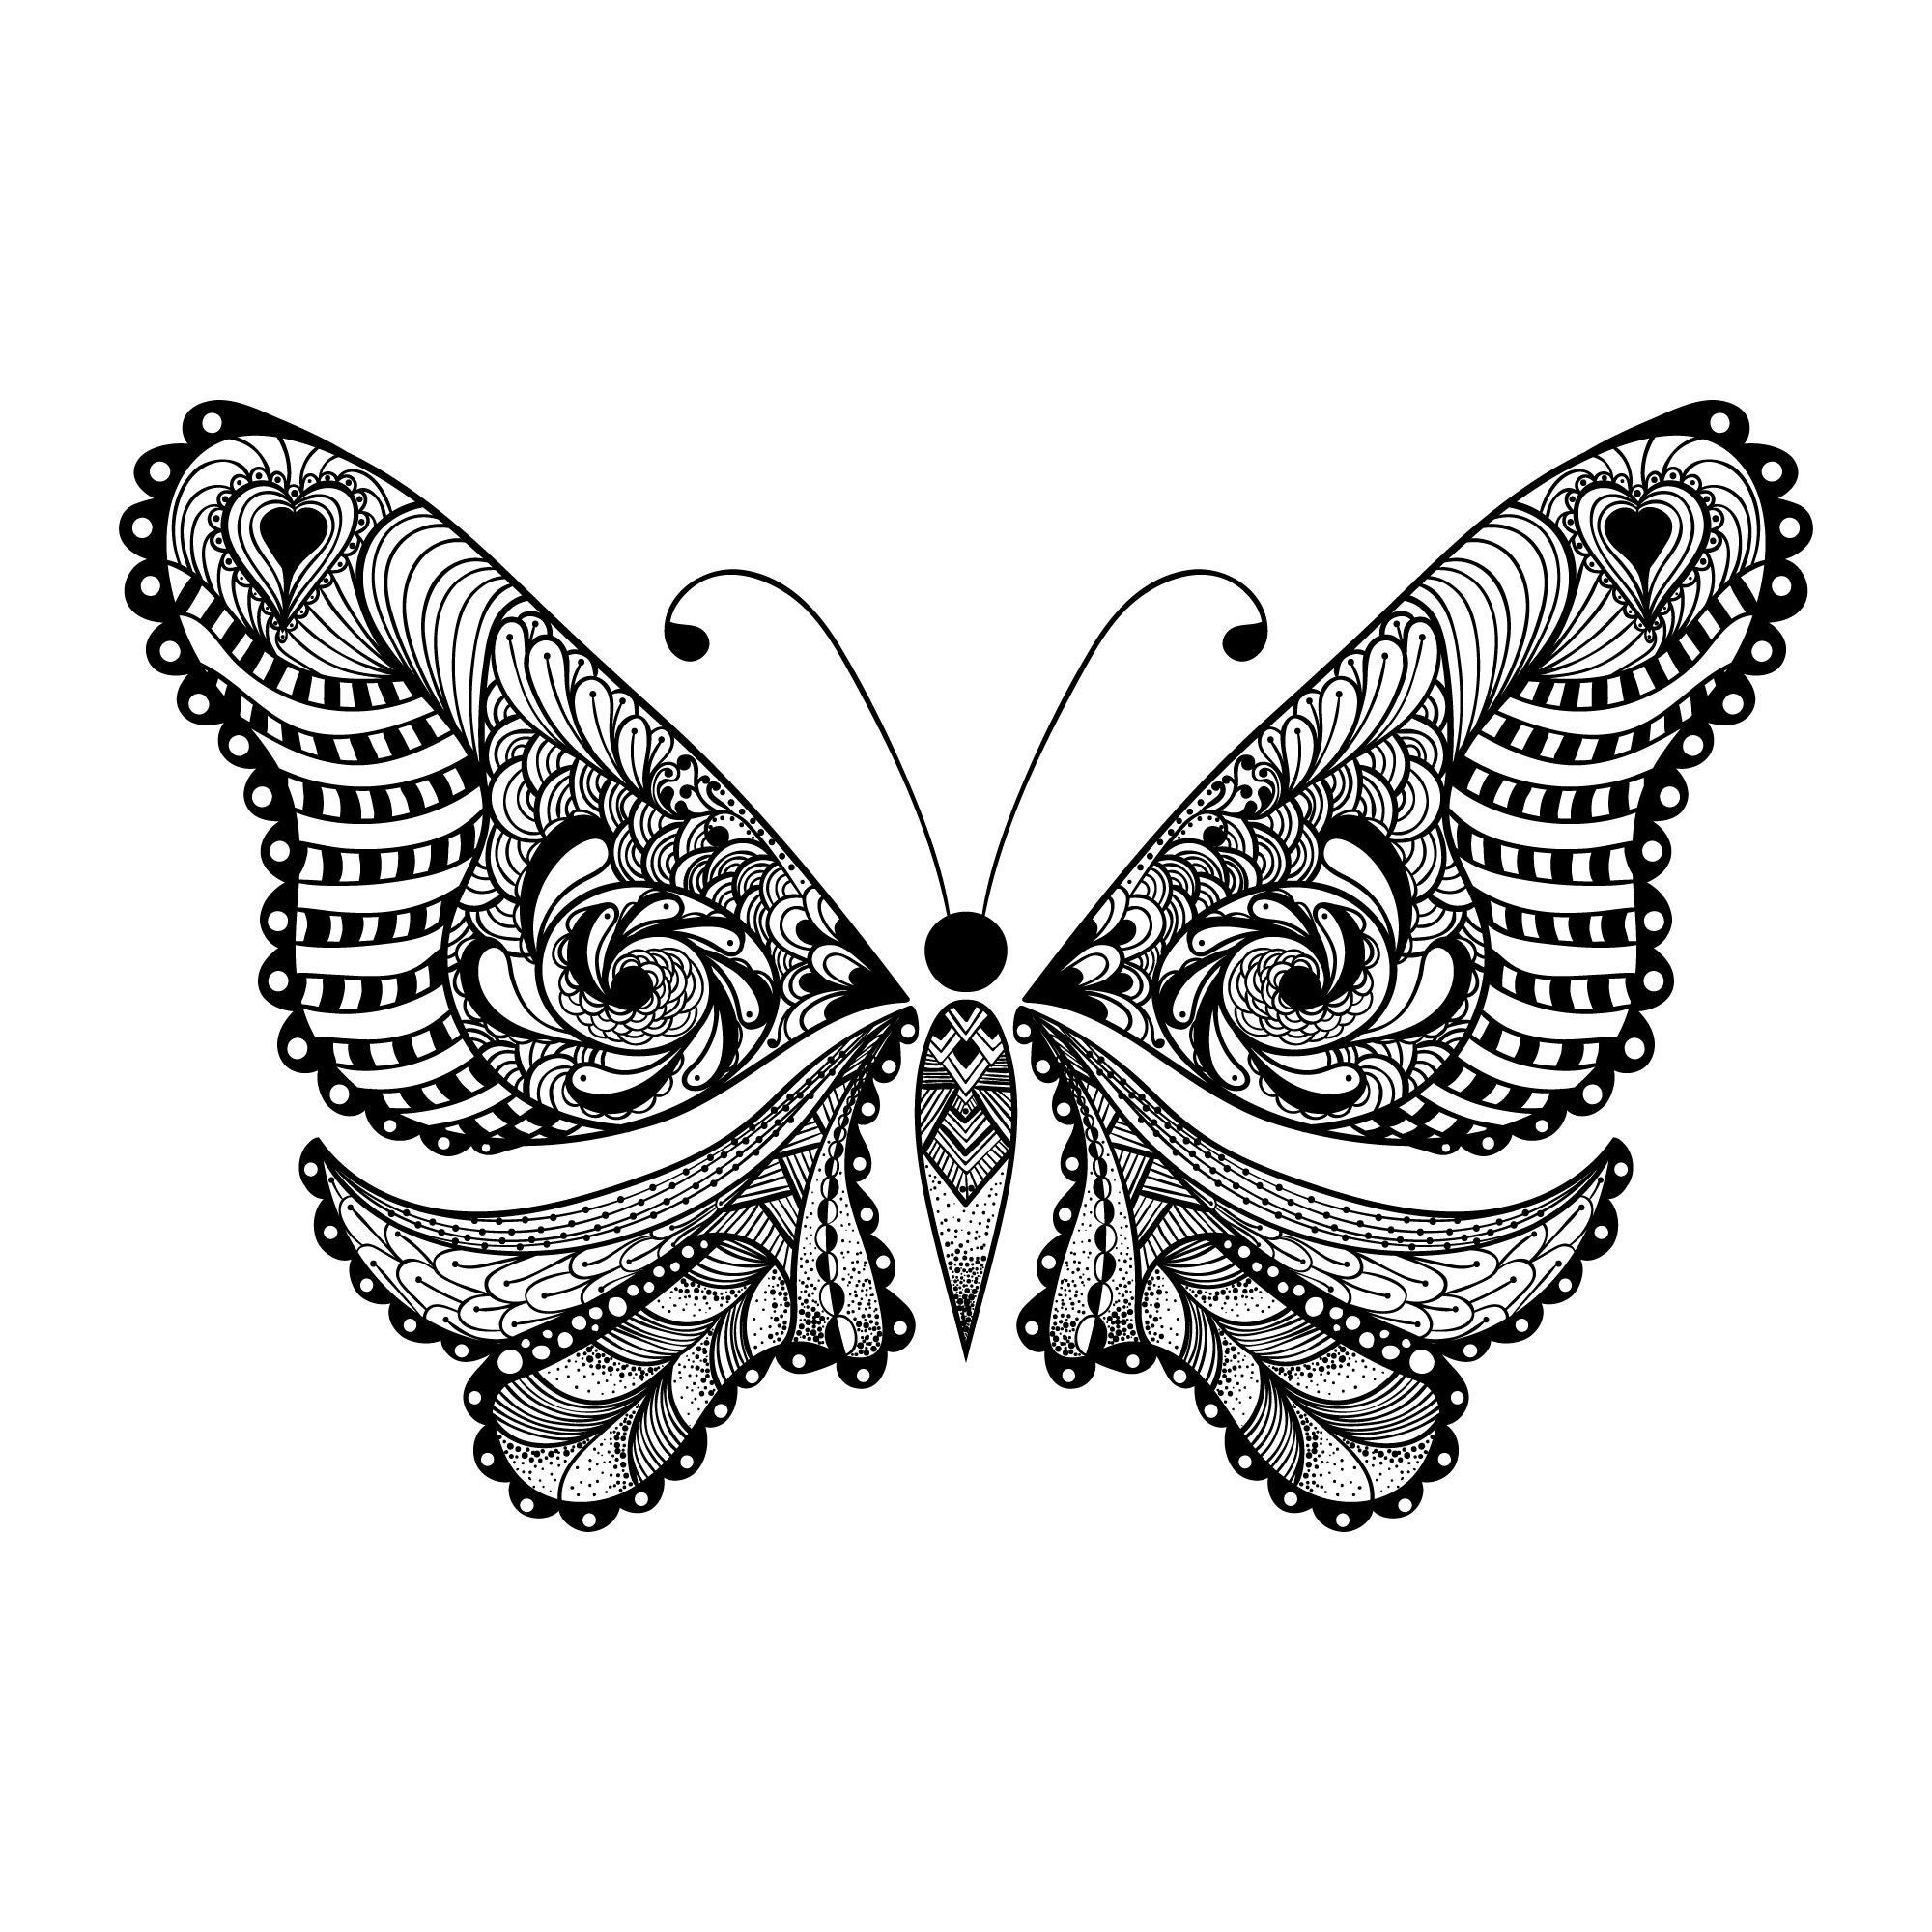 Zentangle Butterfly Free Vector